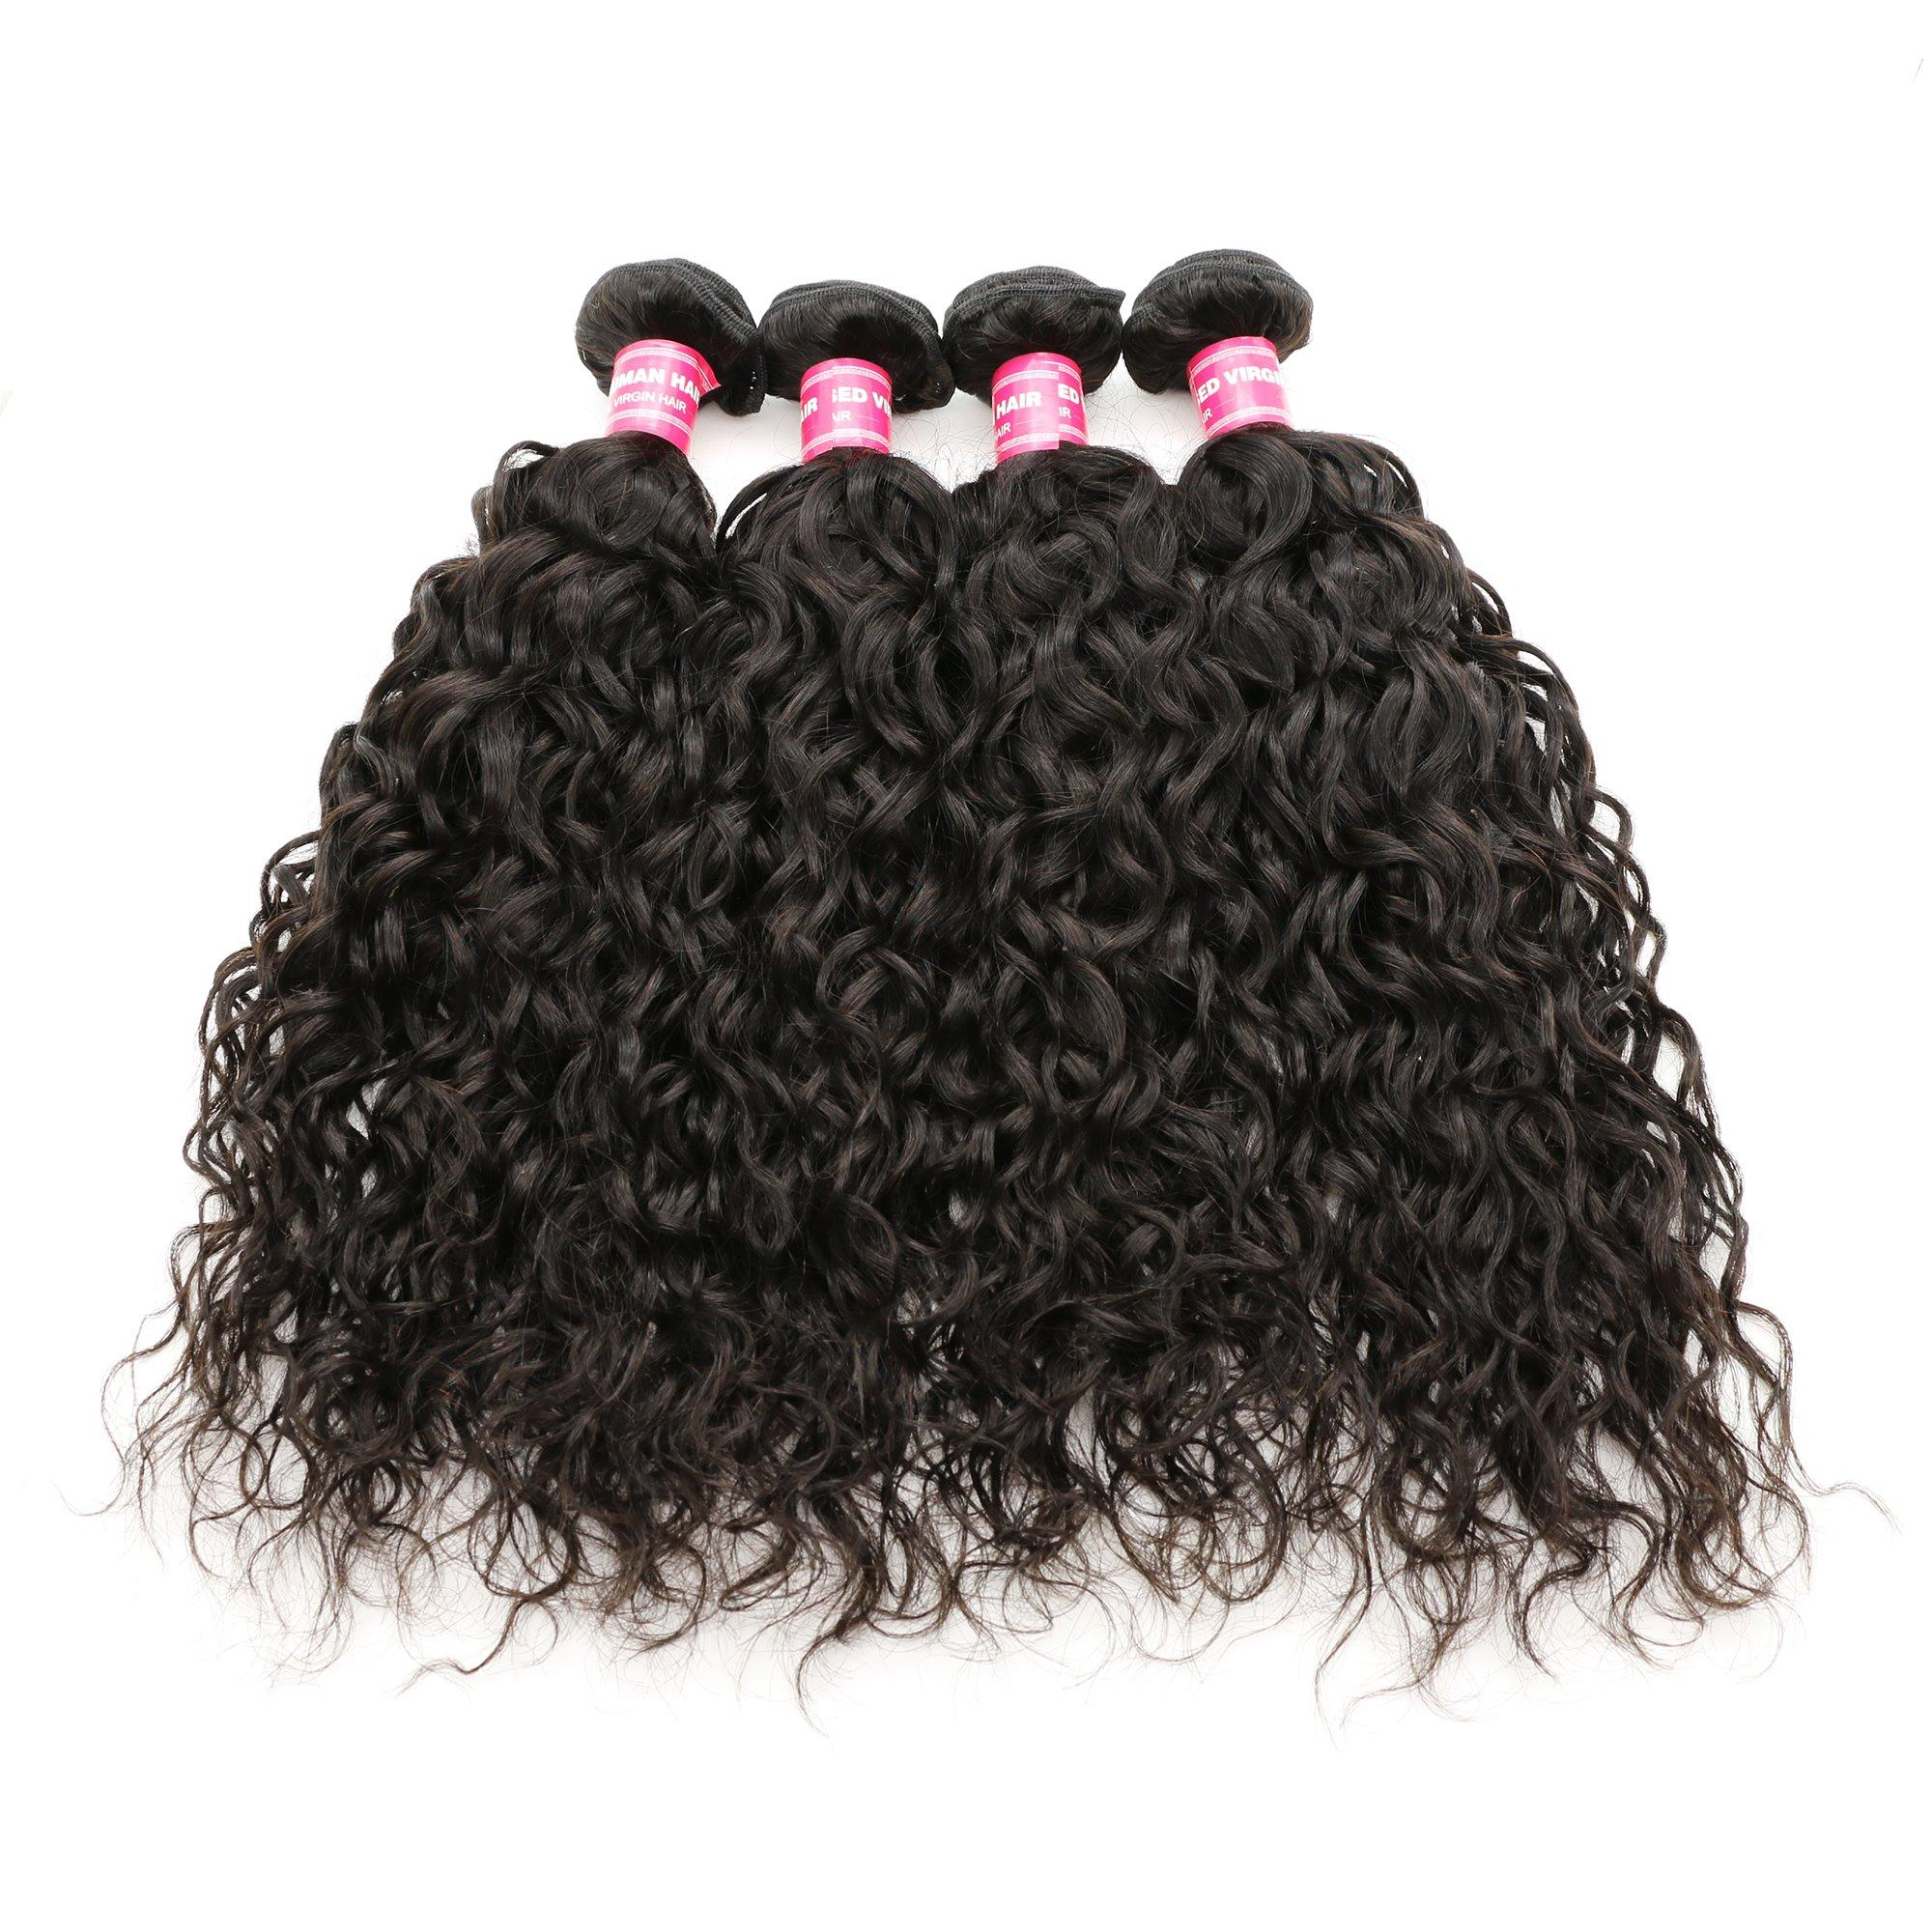 UNice Hair image 12